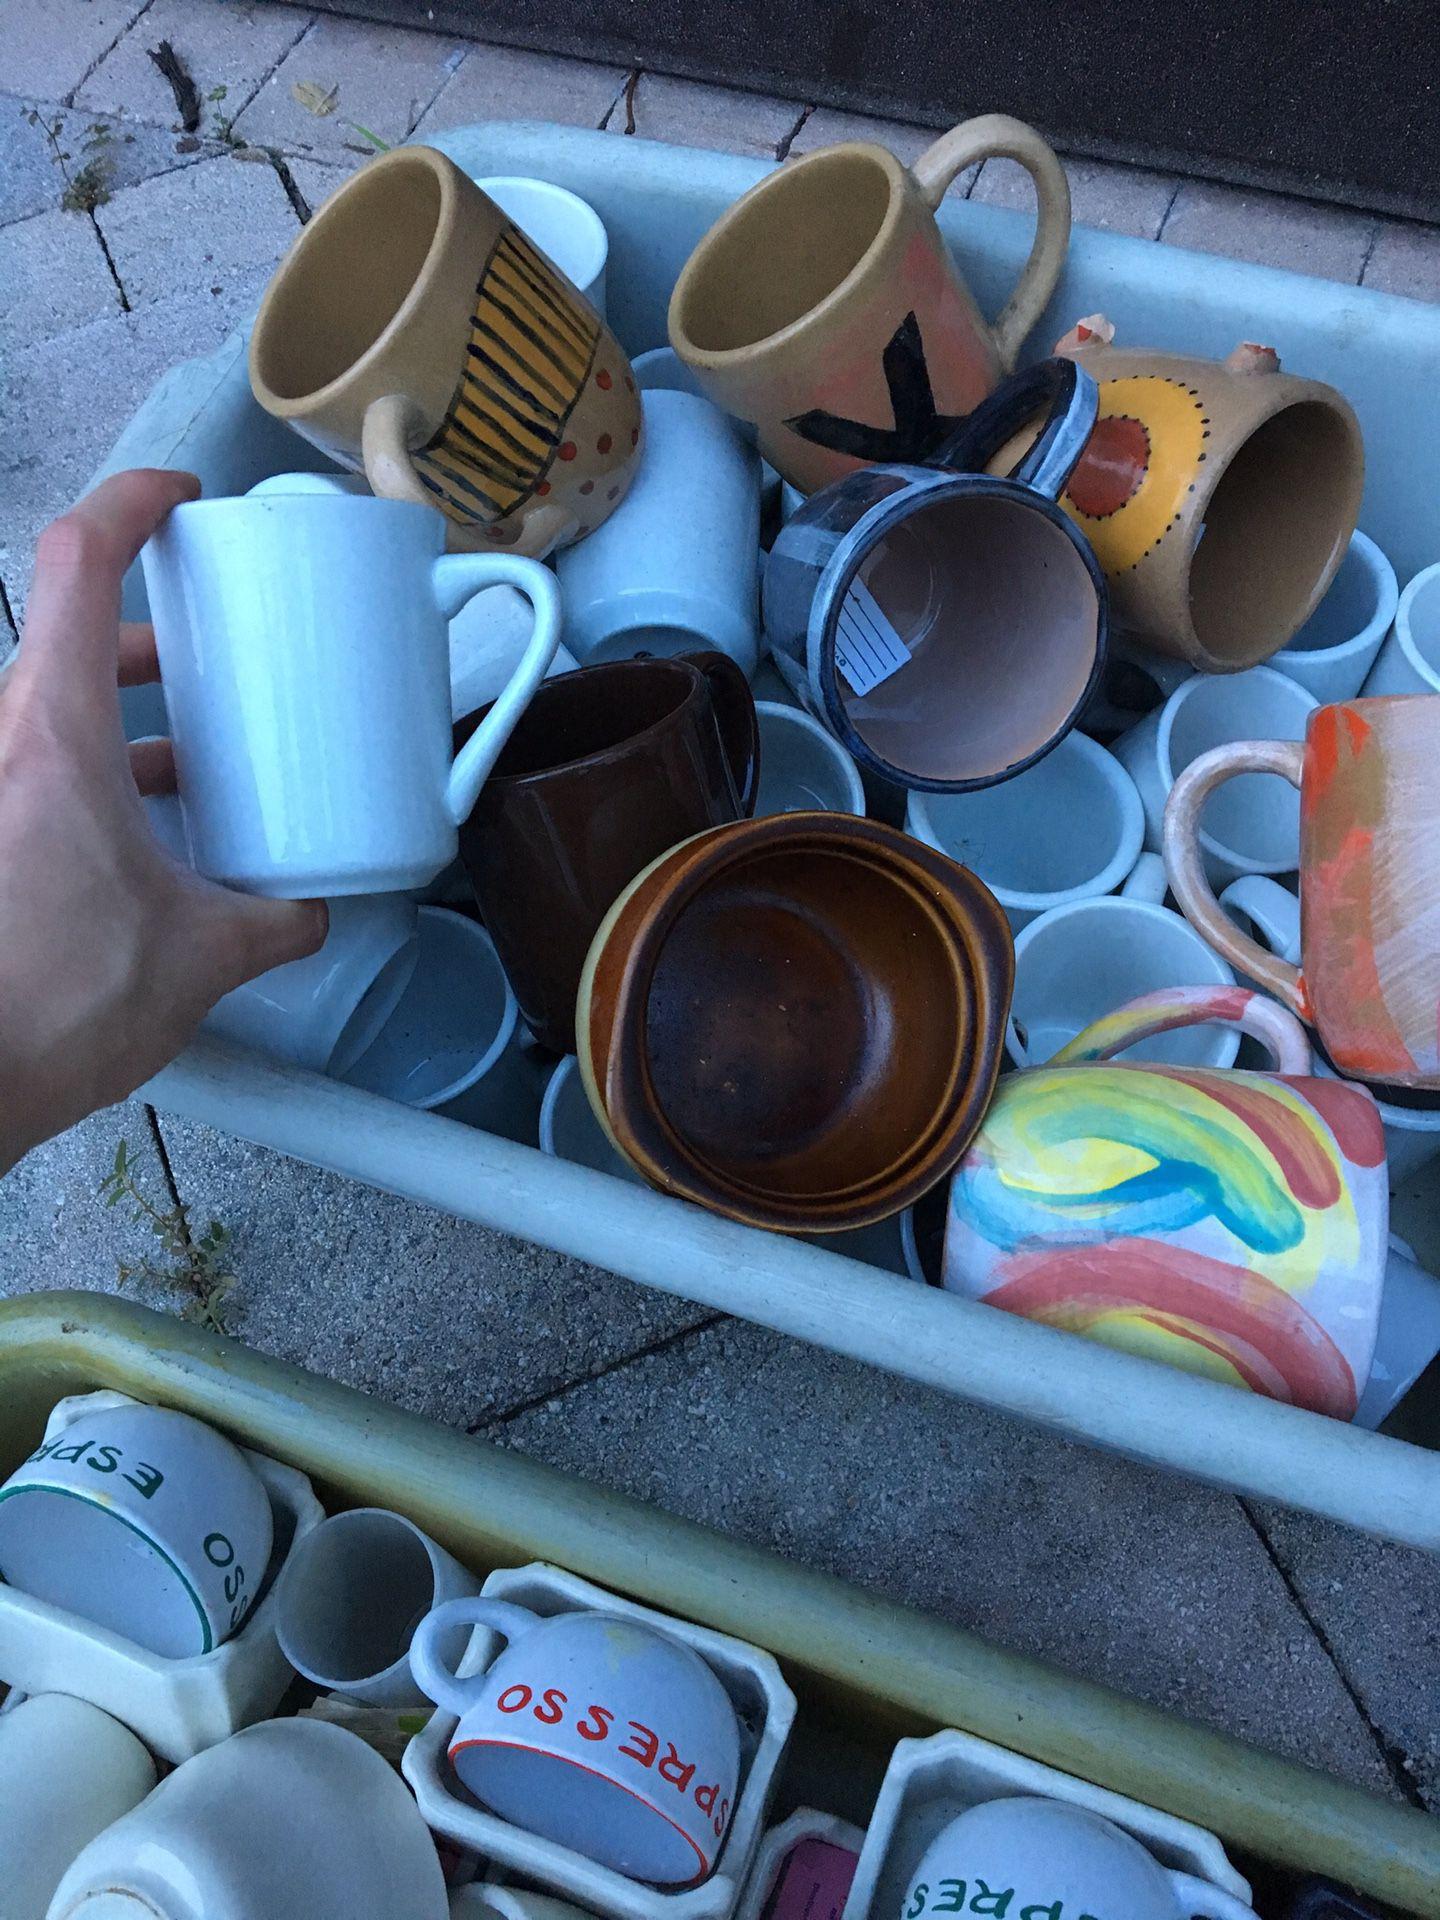 Several coffee mugs/tea mugs/espresso mugs/etc